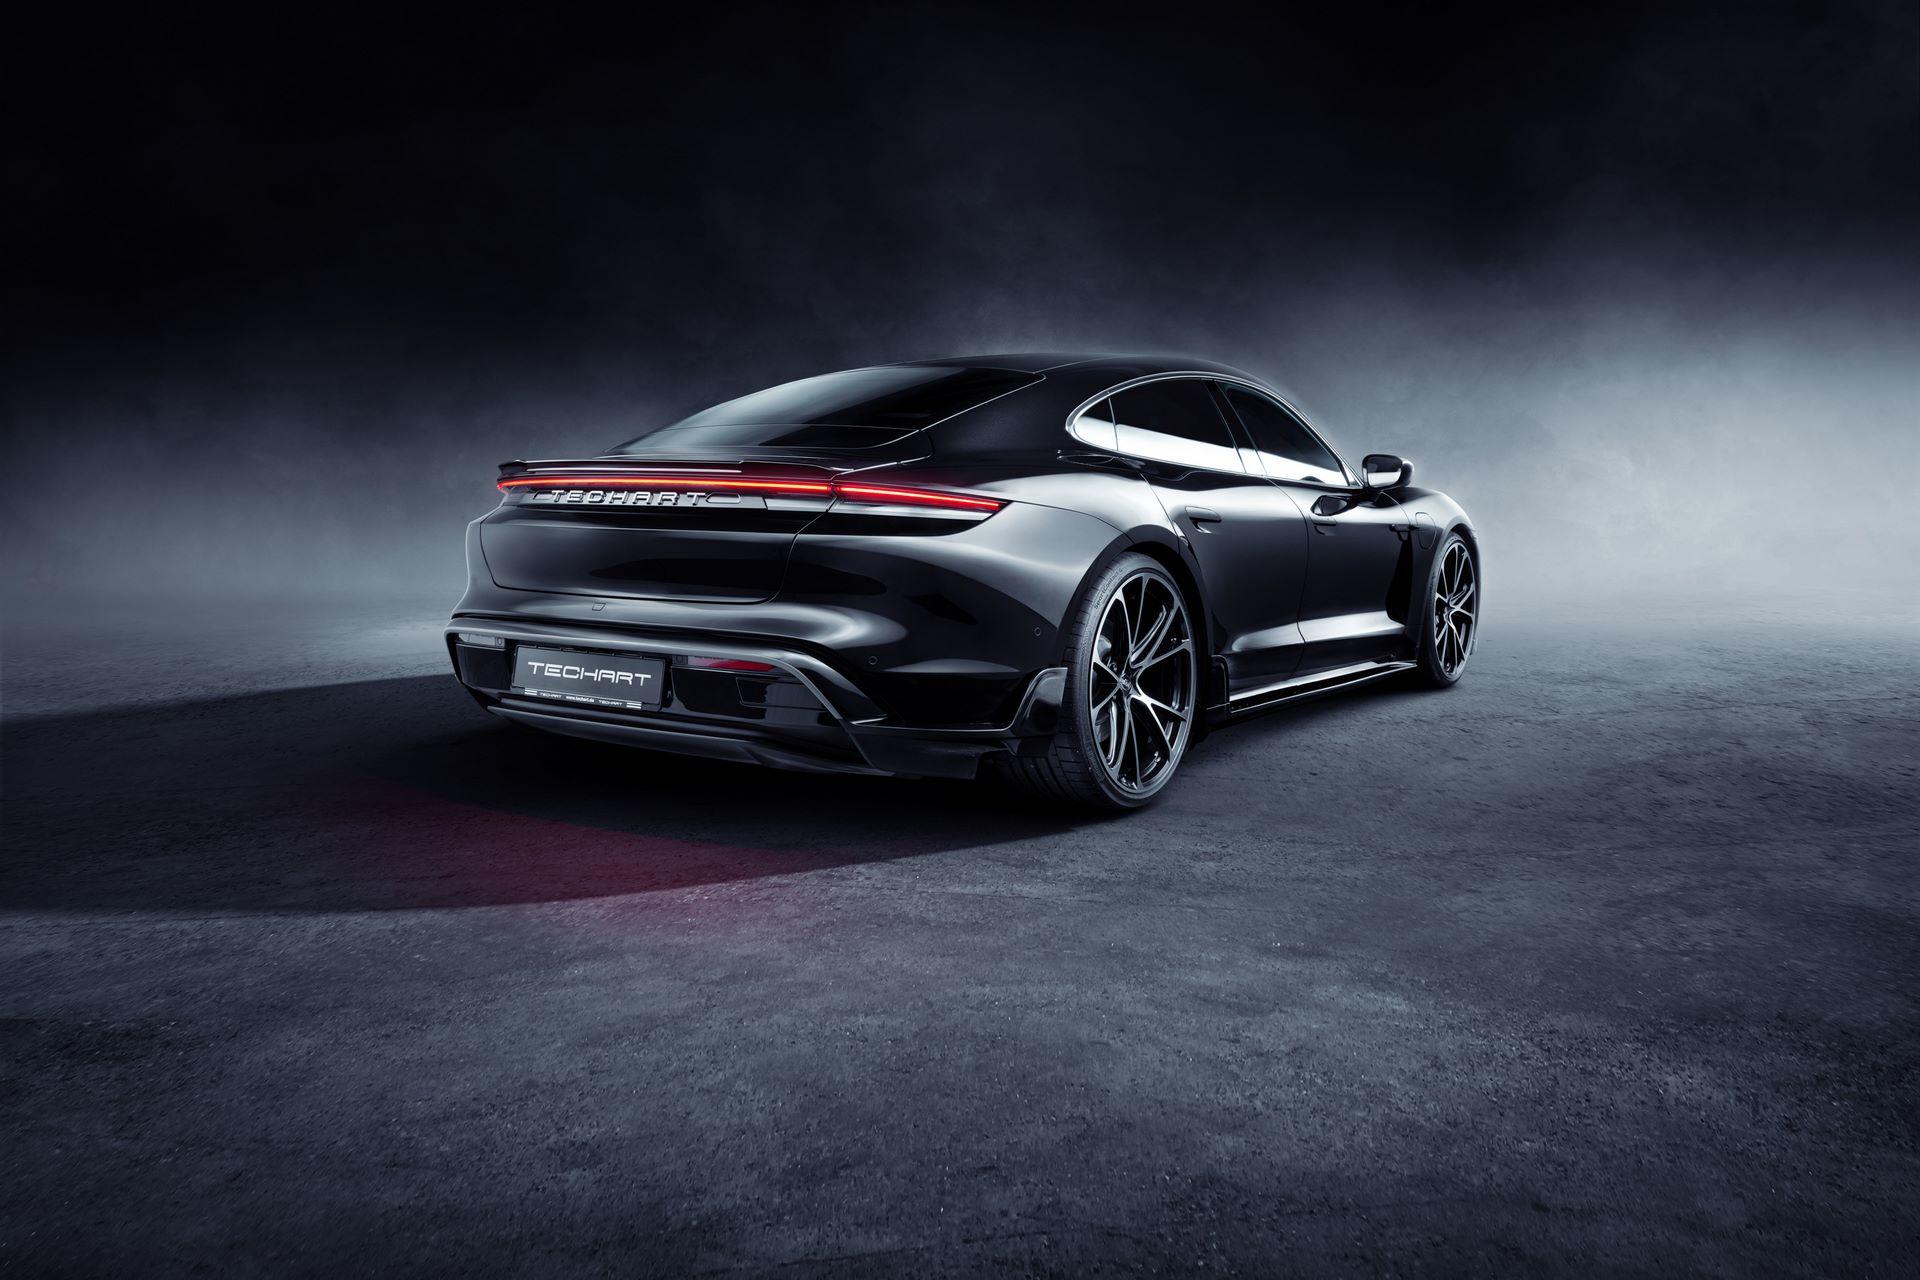 Porsche-Taycan-bodykit-by-TechArt-15